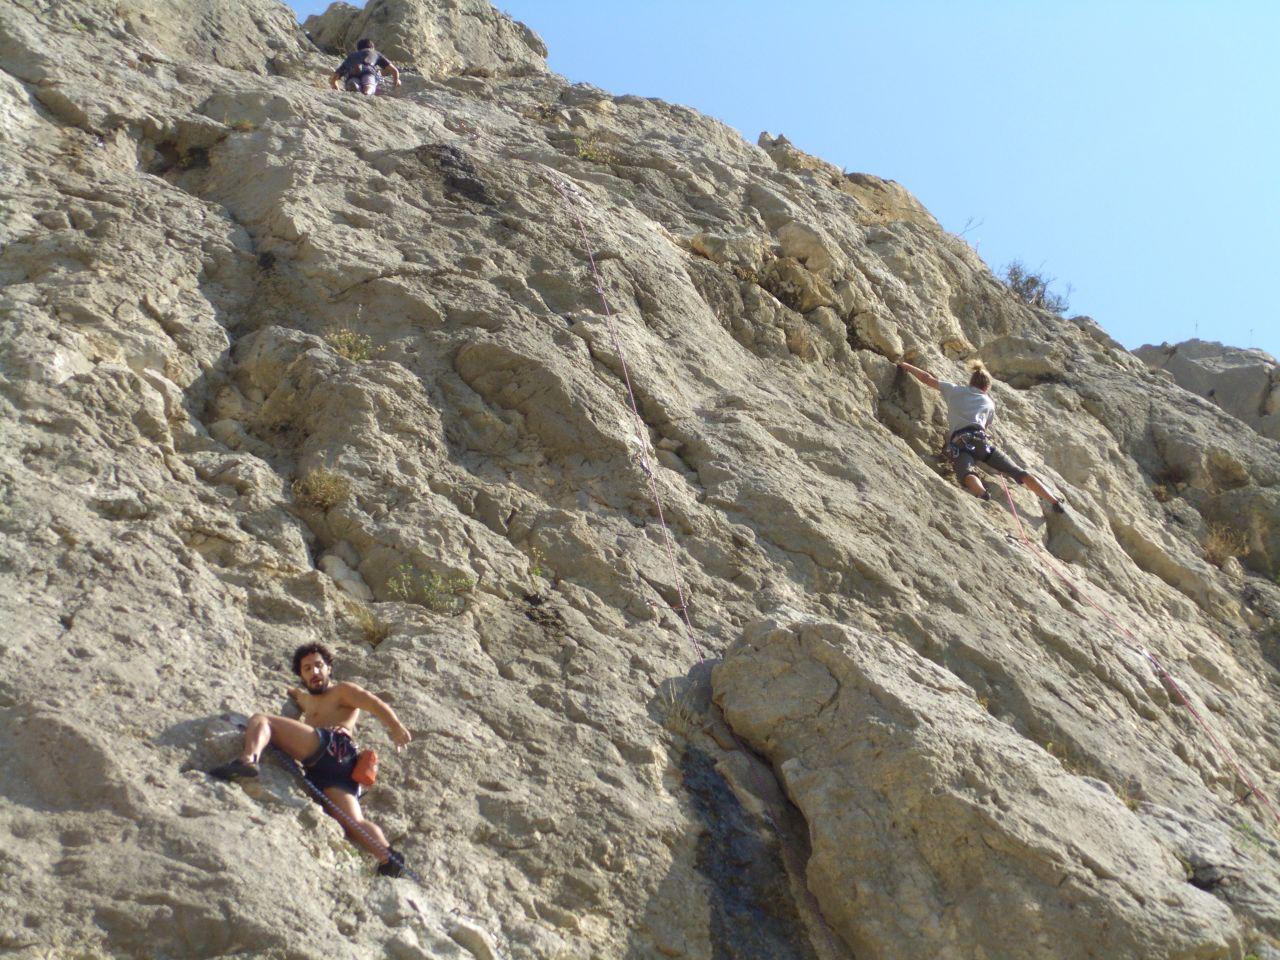 Sella rock climbing holidays in Costa Blanca flickr image by Protozoo